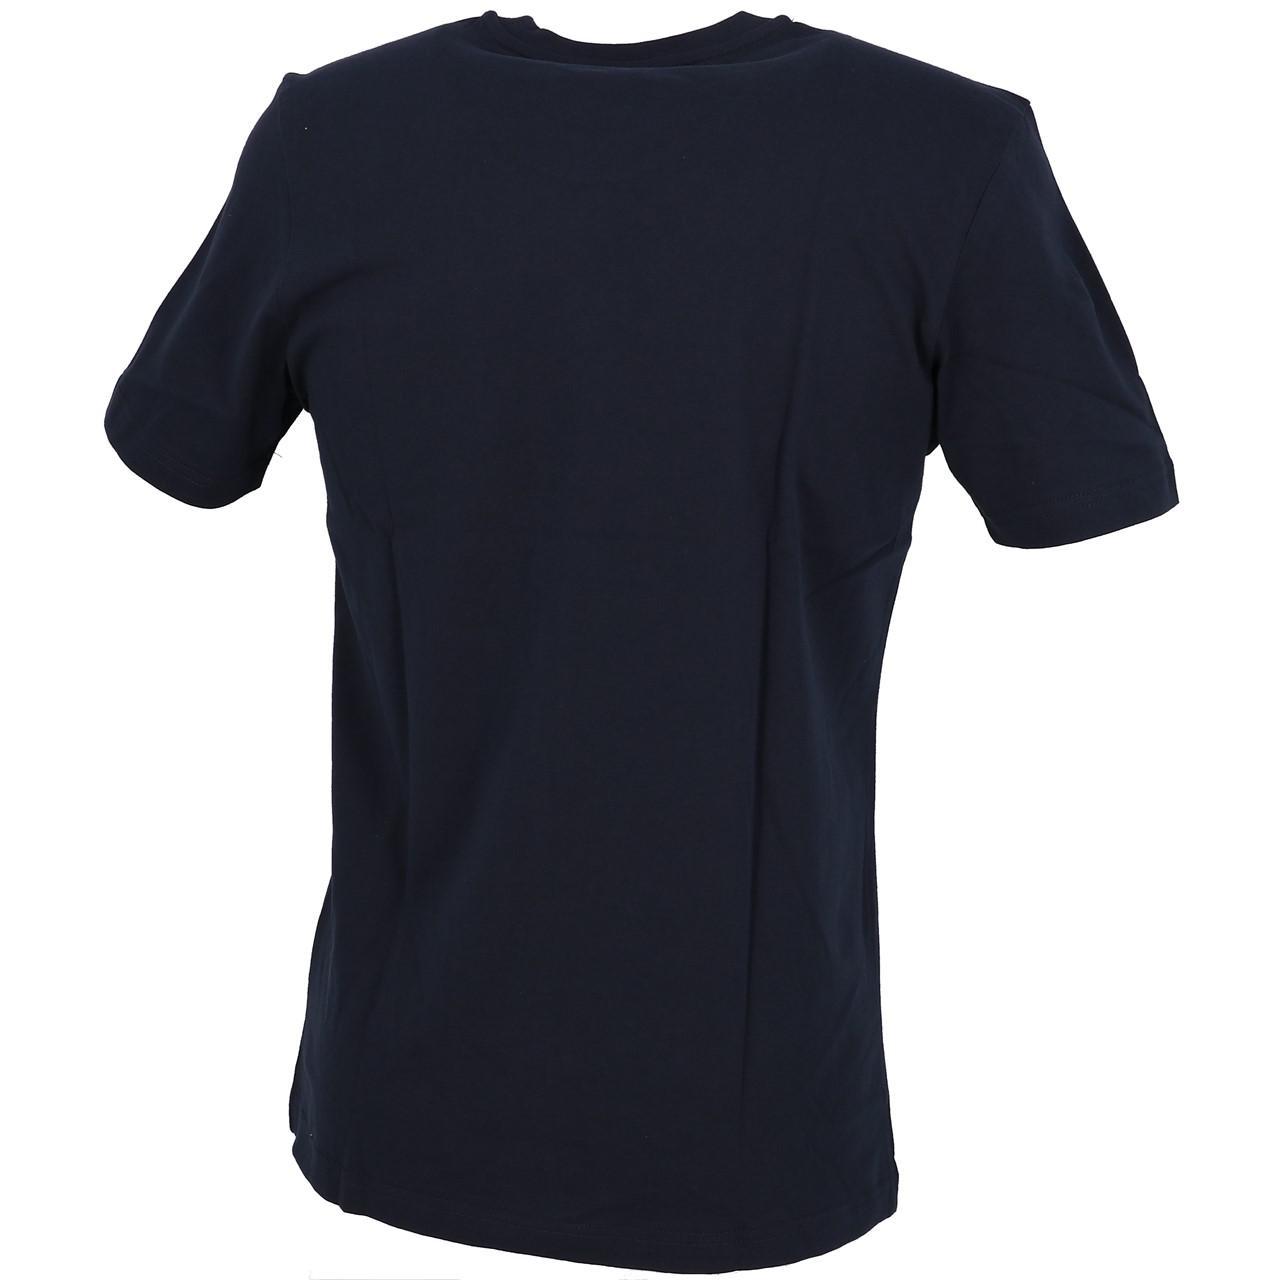 Short-Adidas-Dist-Fnt-Navy-White-Mc-Tee-Blue-29223-New thumbnail 5